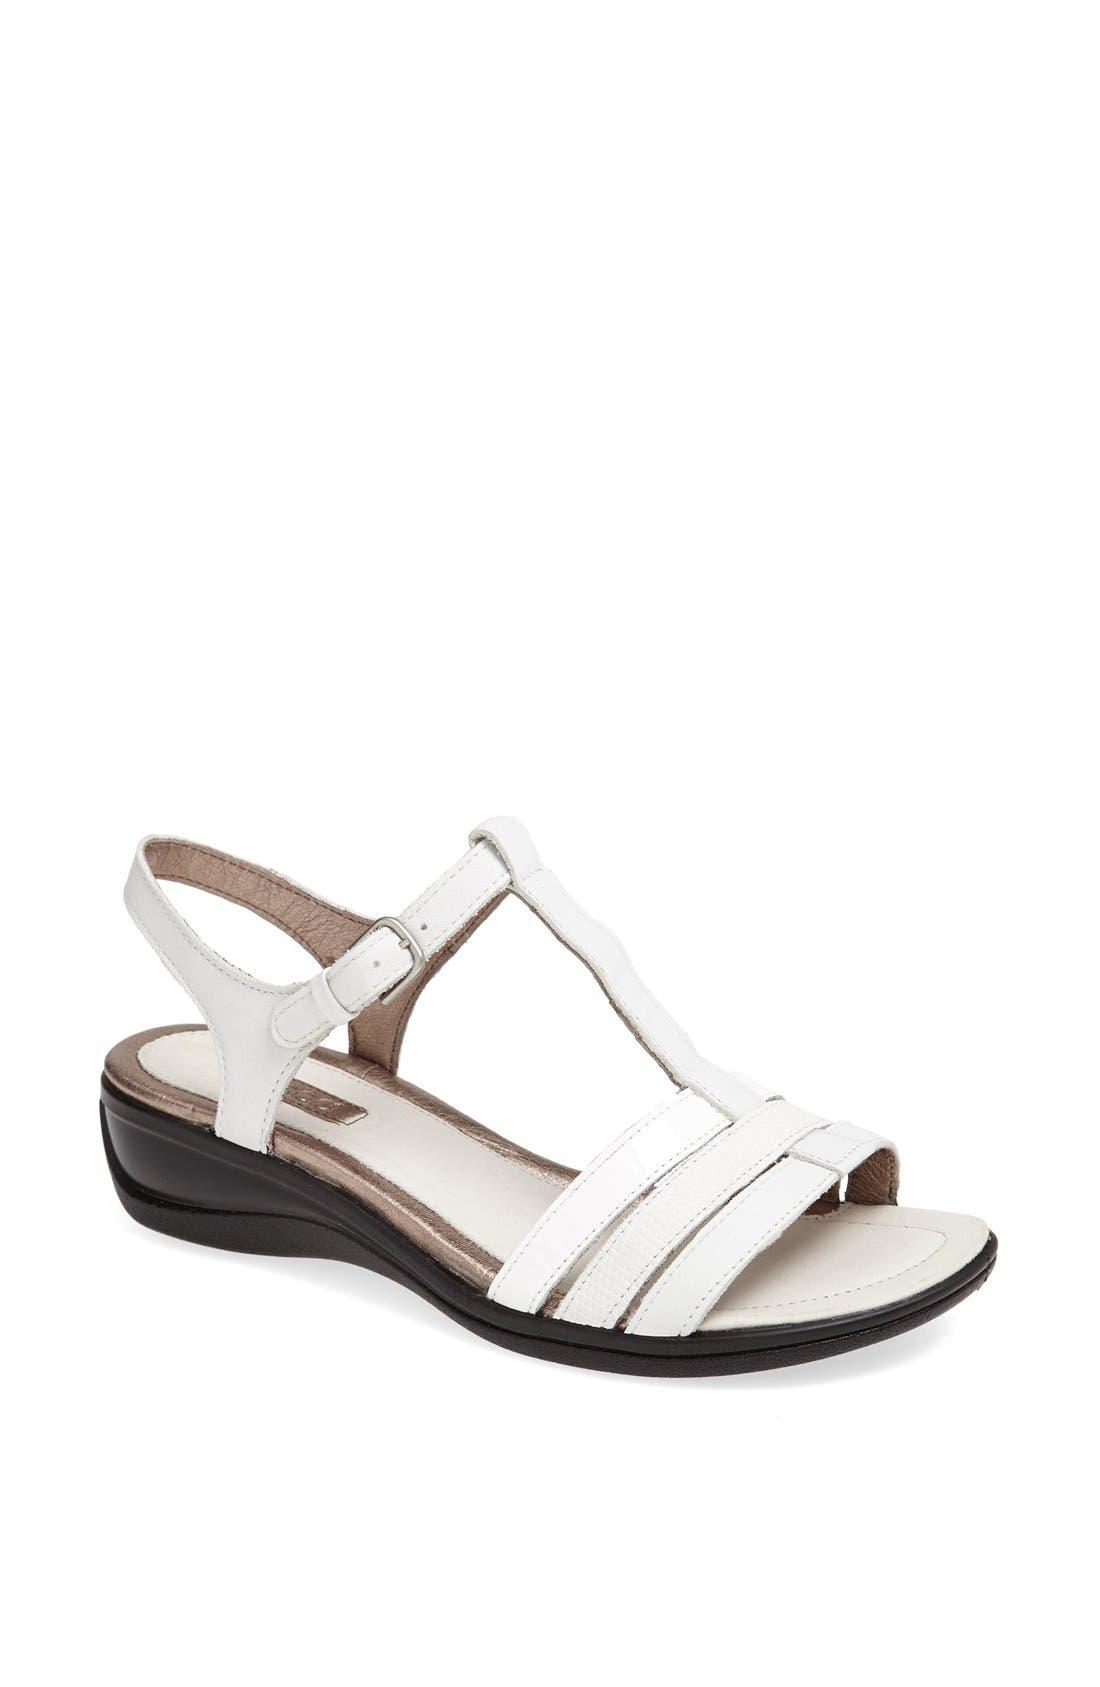 Alternate Image 1 Selected - ECCO 'Sensata' Sandal